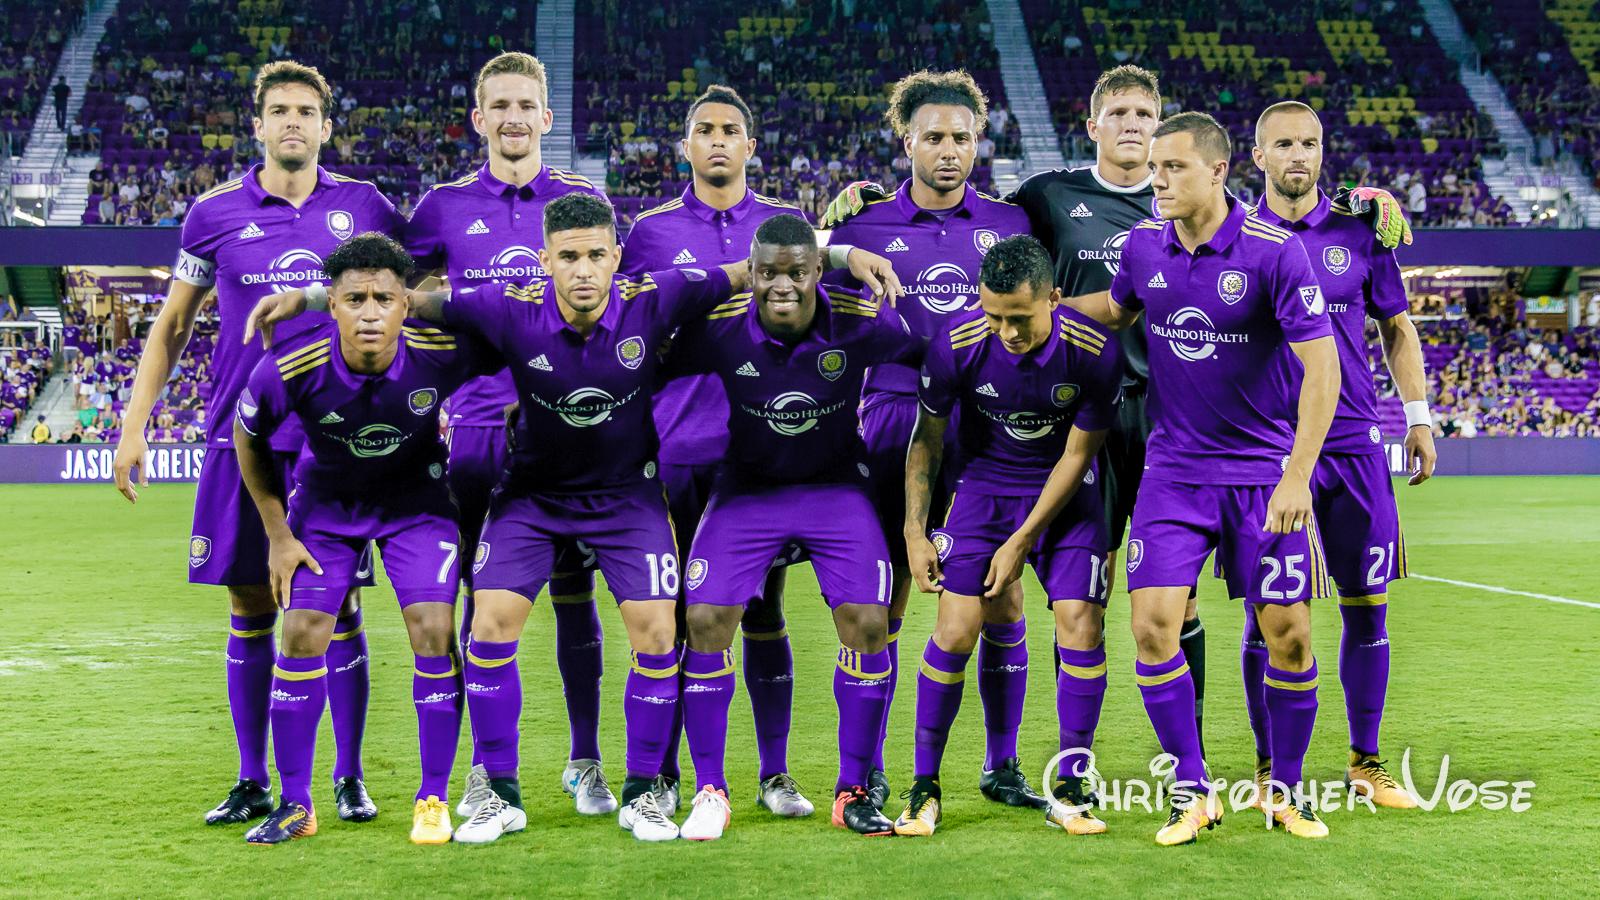 2017-08-26 Orlando City SC Team Photo.jpg